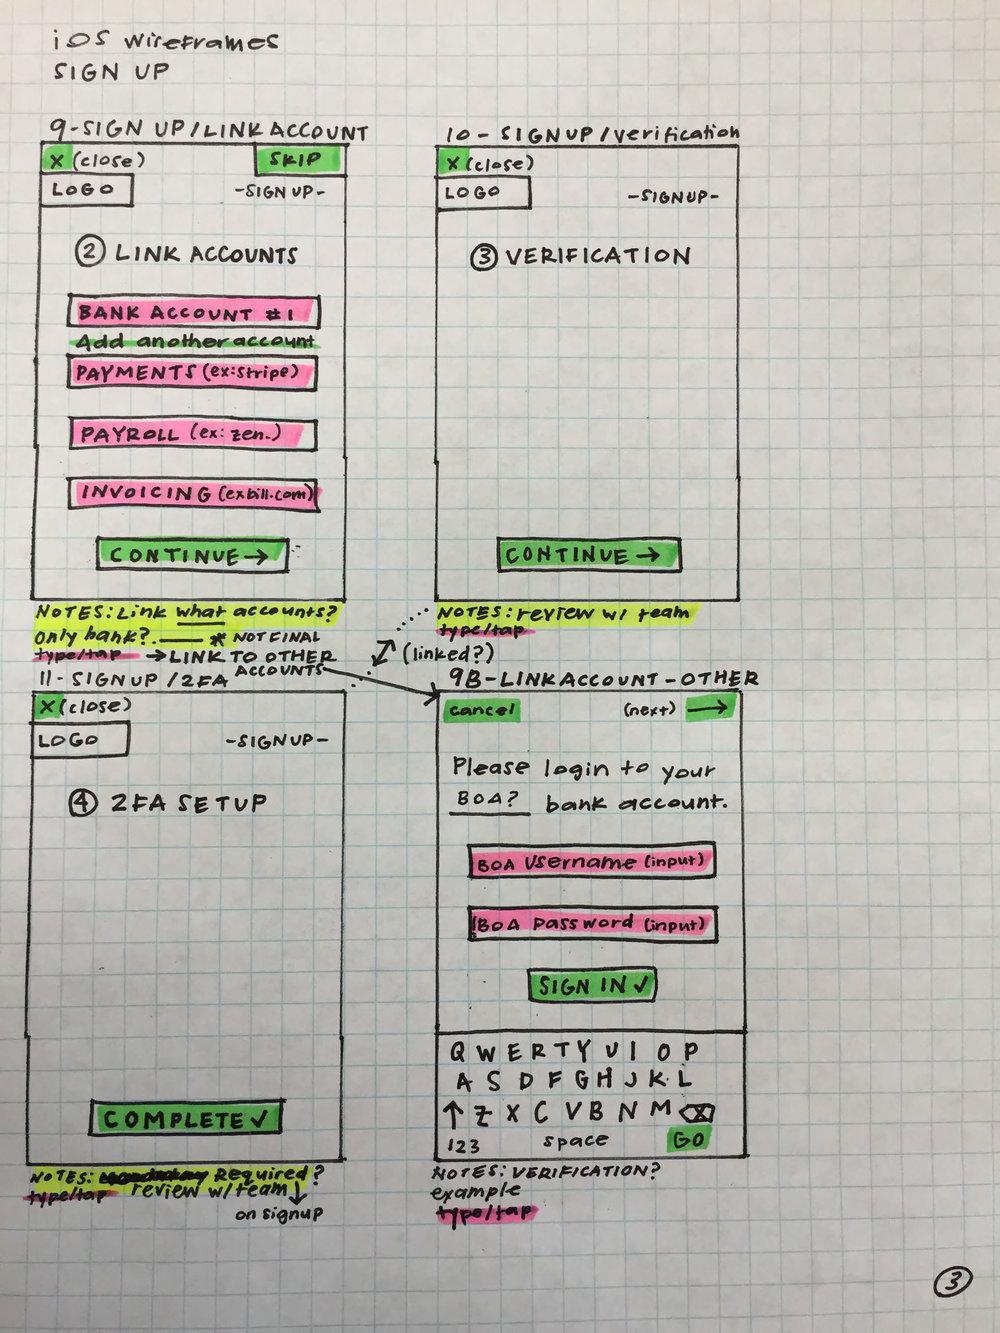 SEED_iOS_Wireframe_RI_Page_3.jpg